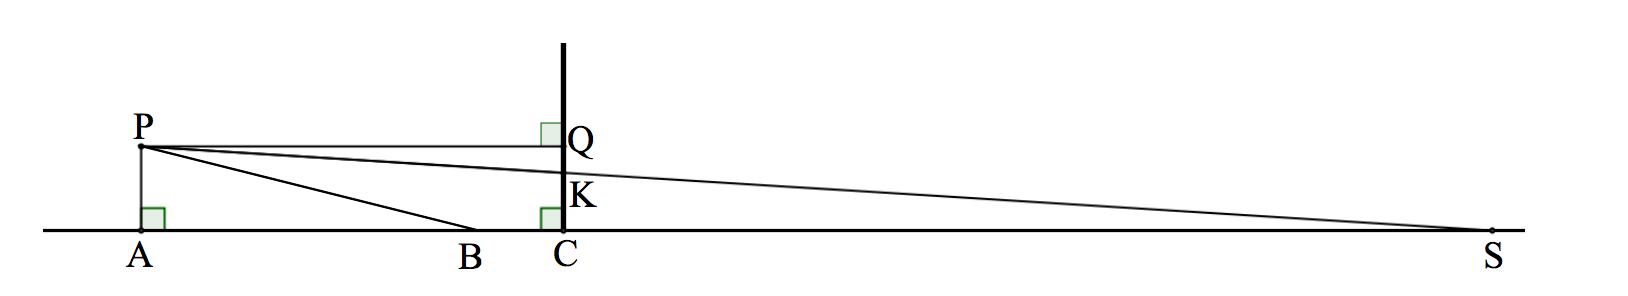 brevet-maths-2014-exercice-6-schema